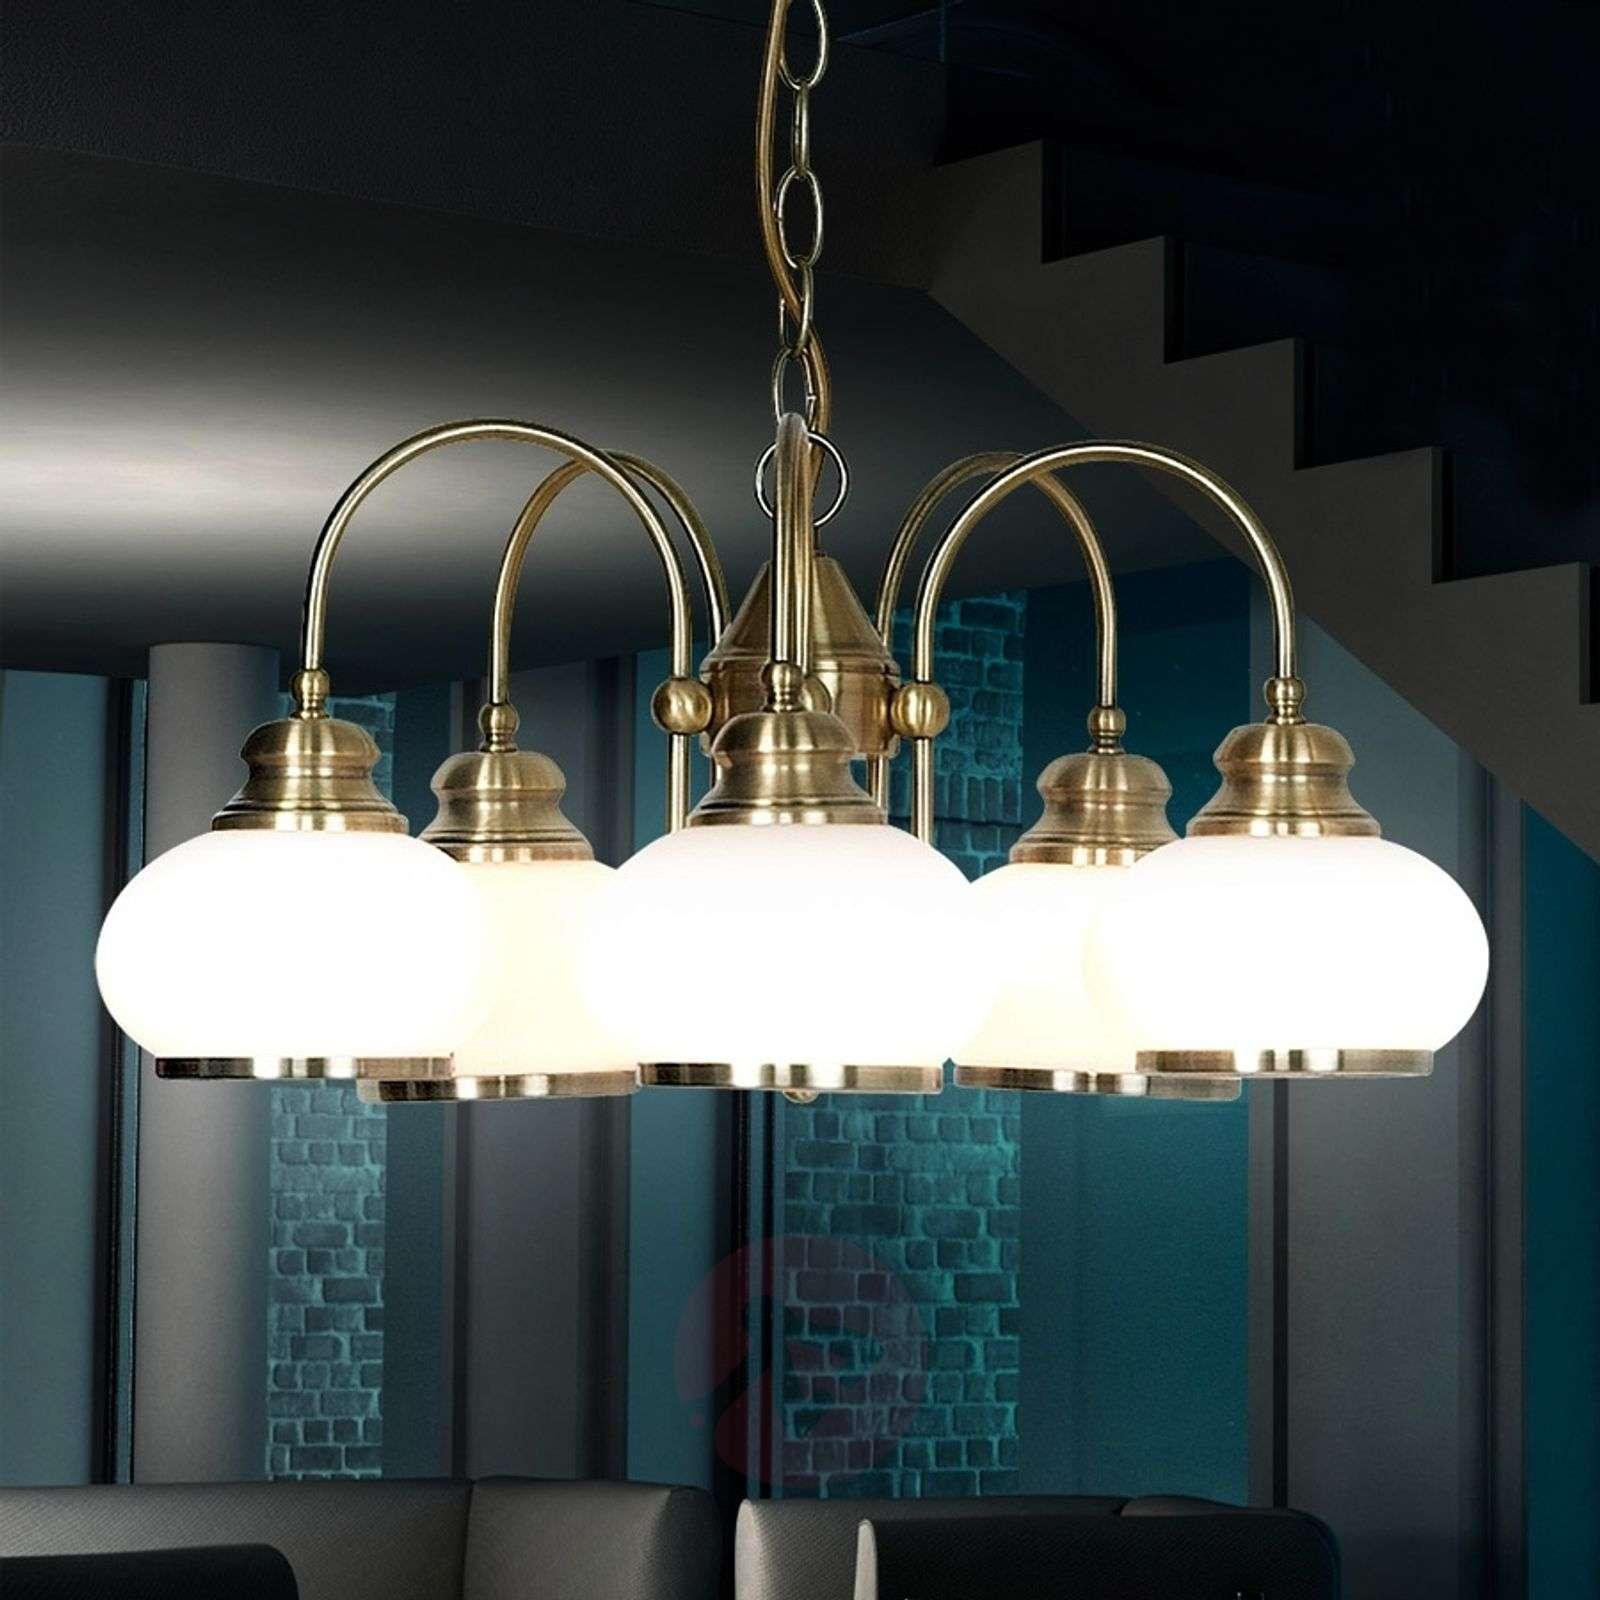 NOSTALGIKA 5 Lamp Pendant Lamp in Antique Brass-4014357-01